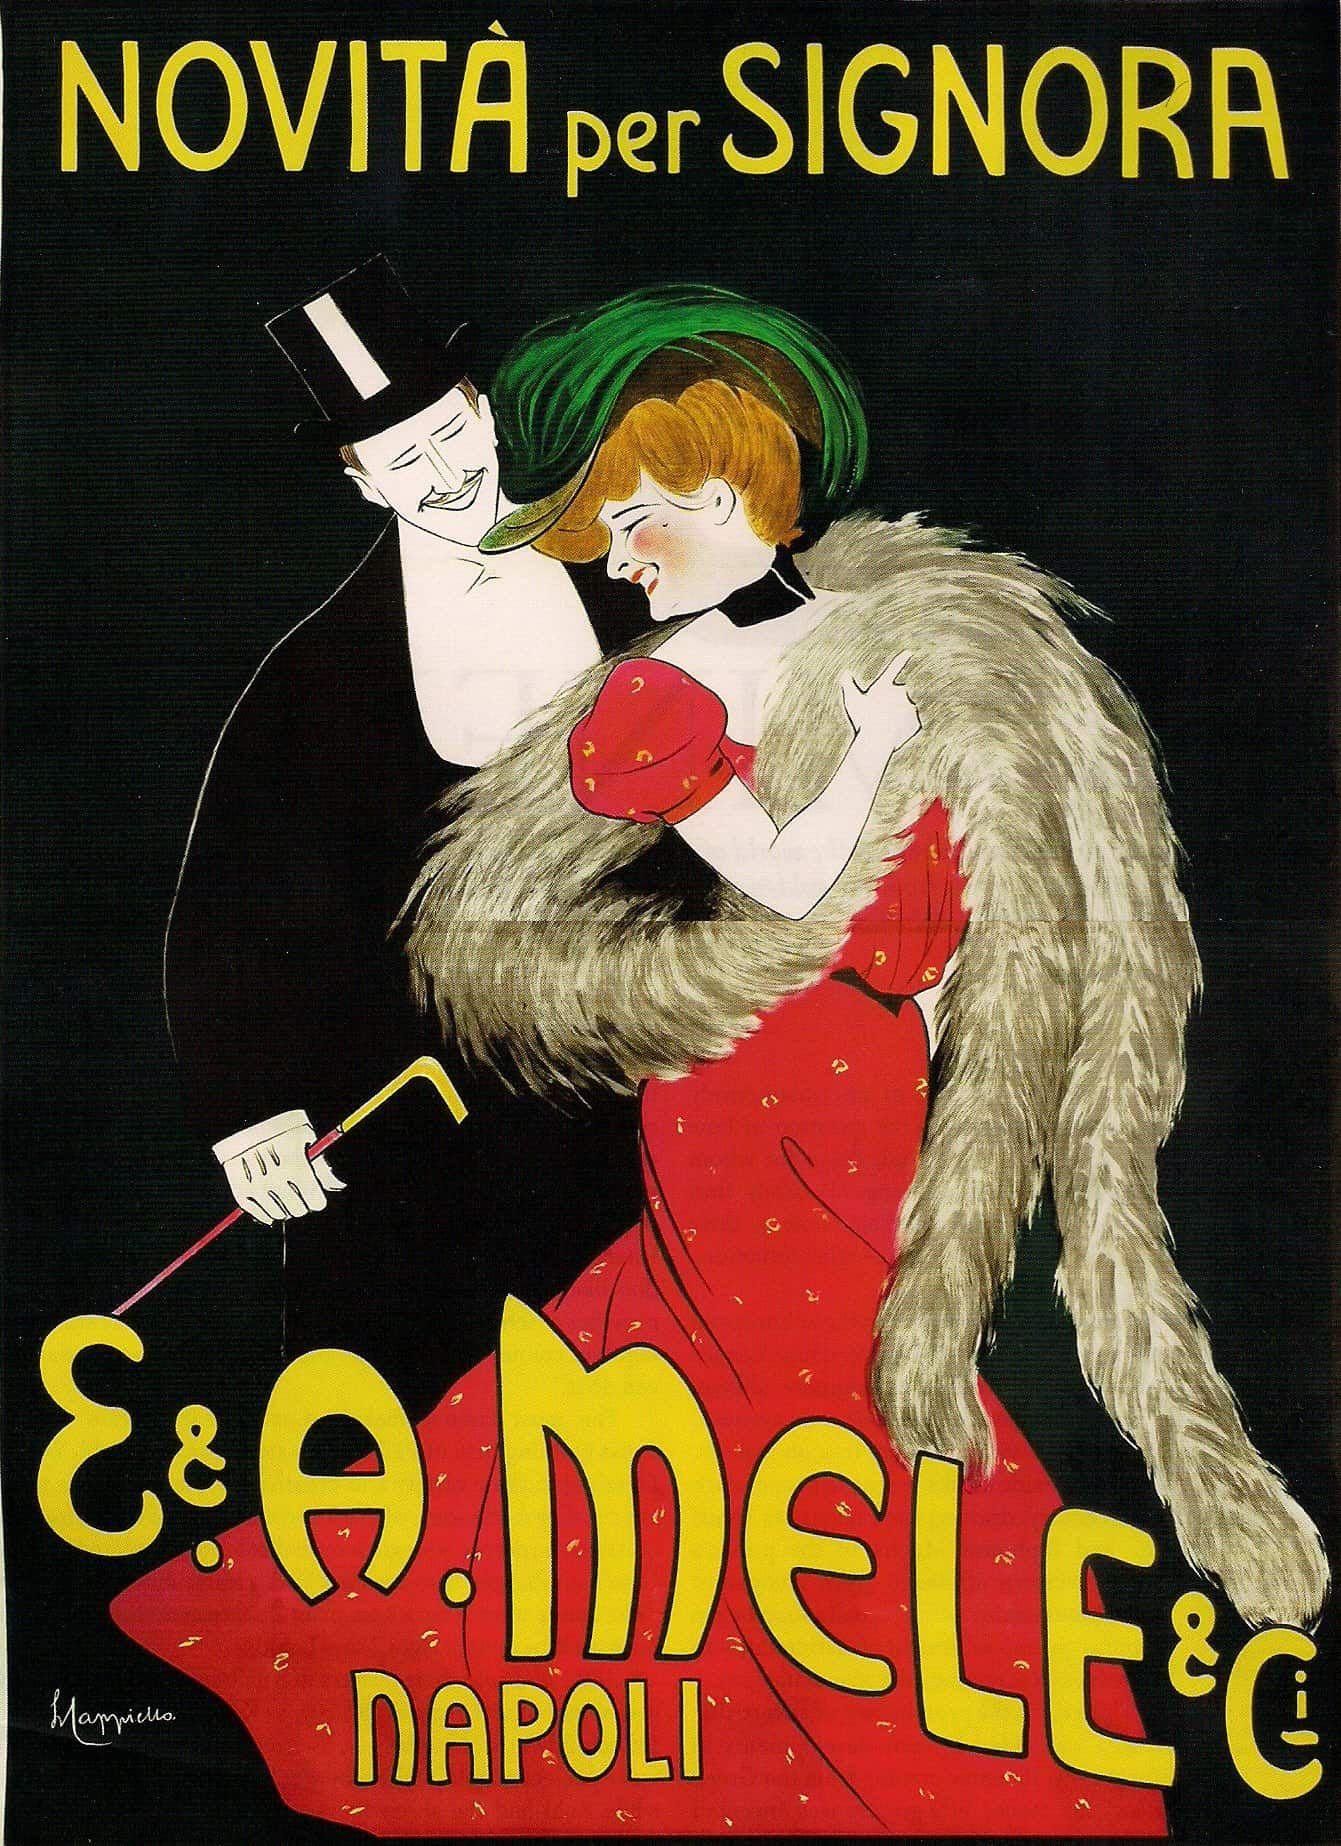 Leonetto Cappiello The Father Of Modern Advertising Poster Leonetto Cappiello Vintage Italian Posters Vintage Poster Art